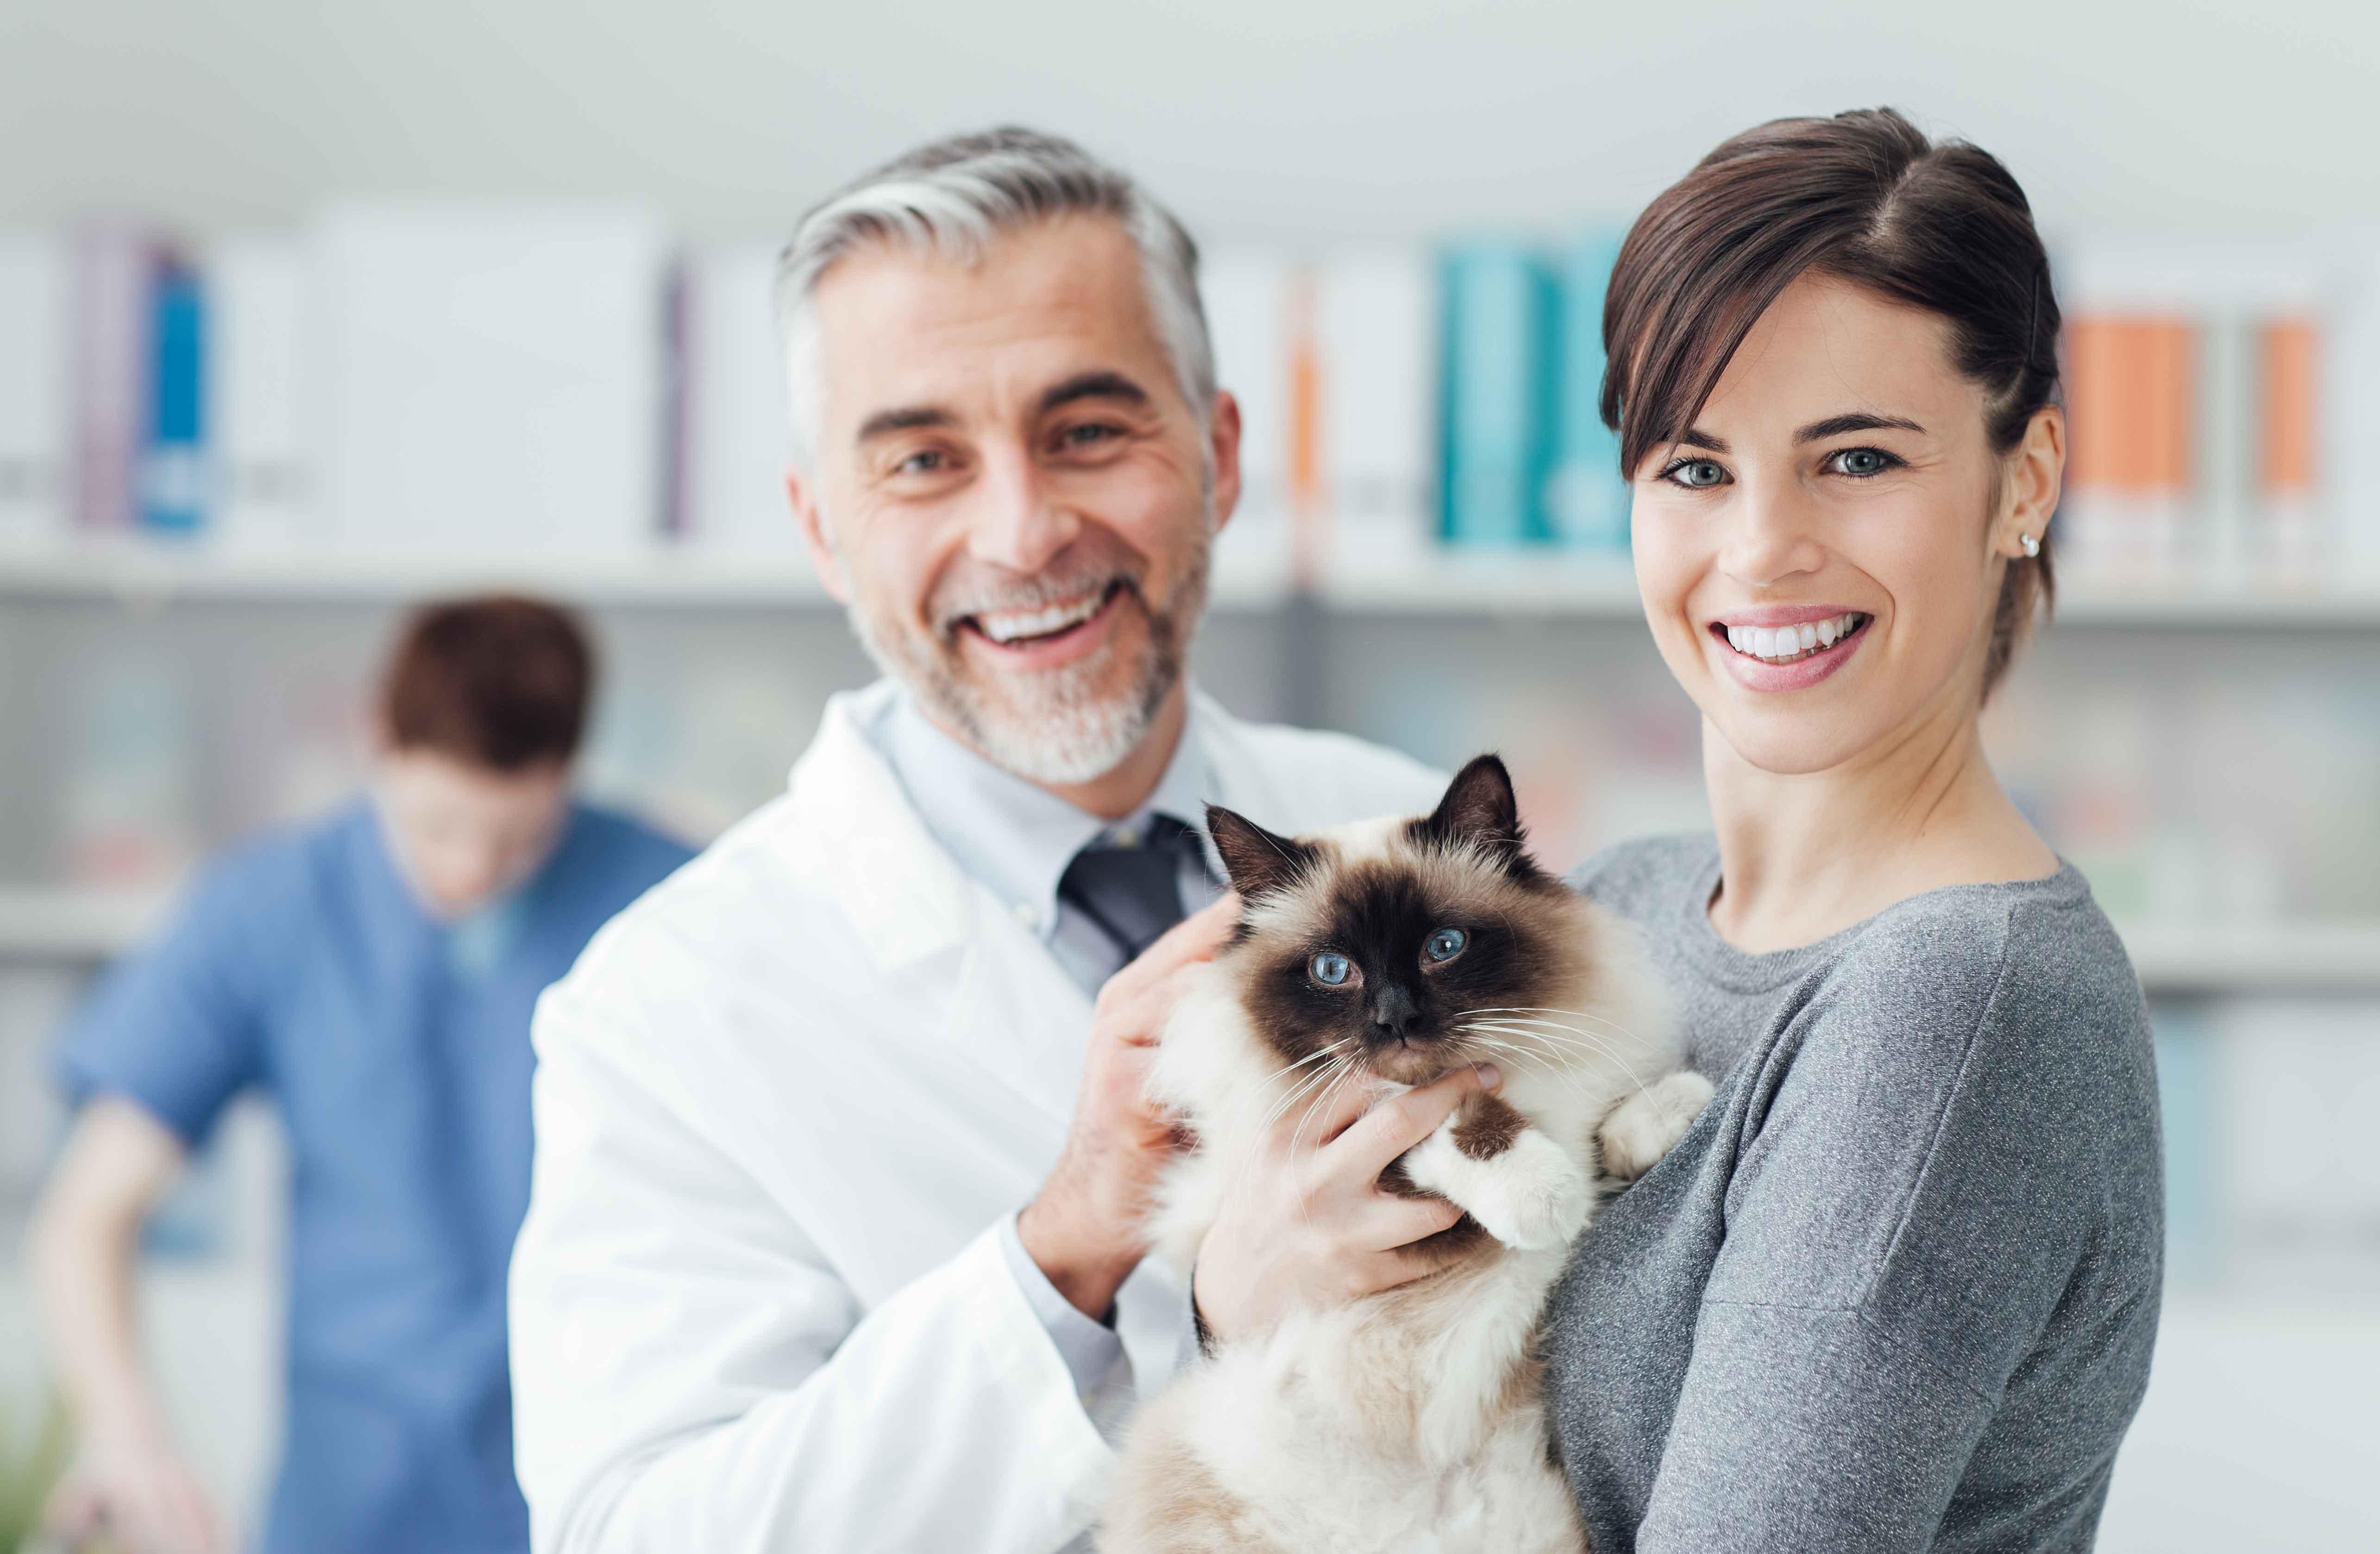 Loans for veterinarians Veterinary practice loans Veterinary loans Veterinary business loans